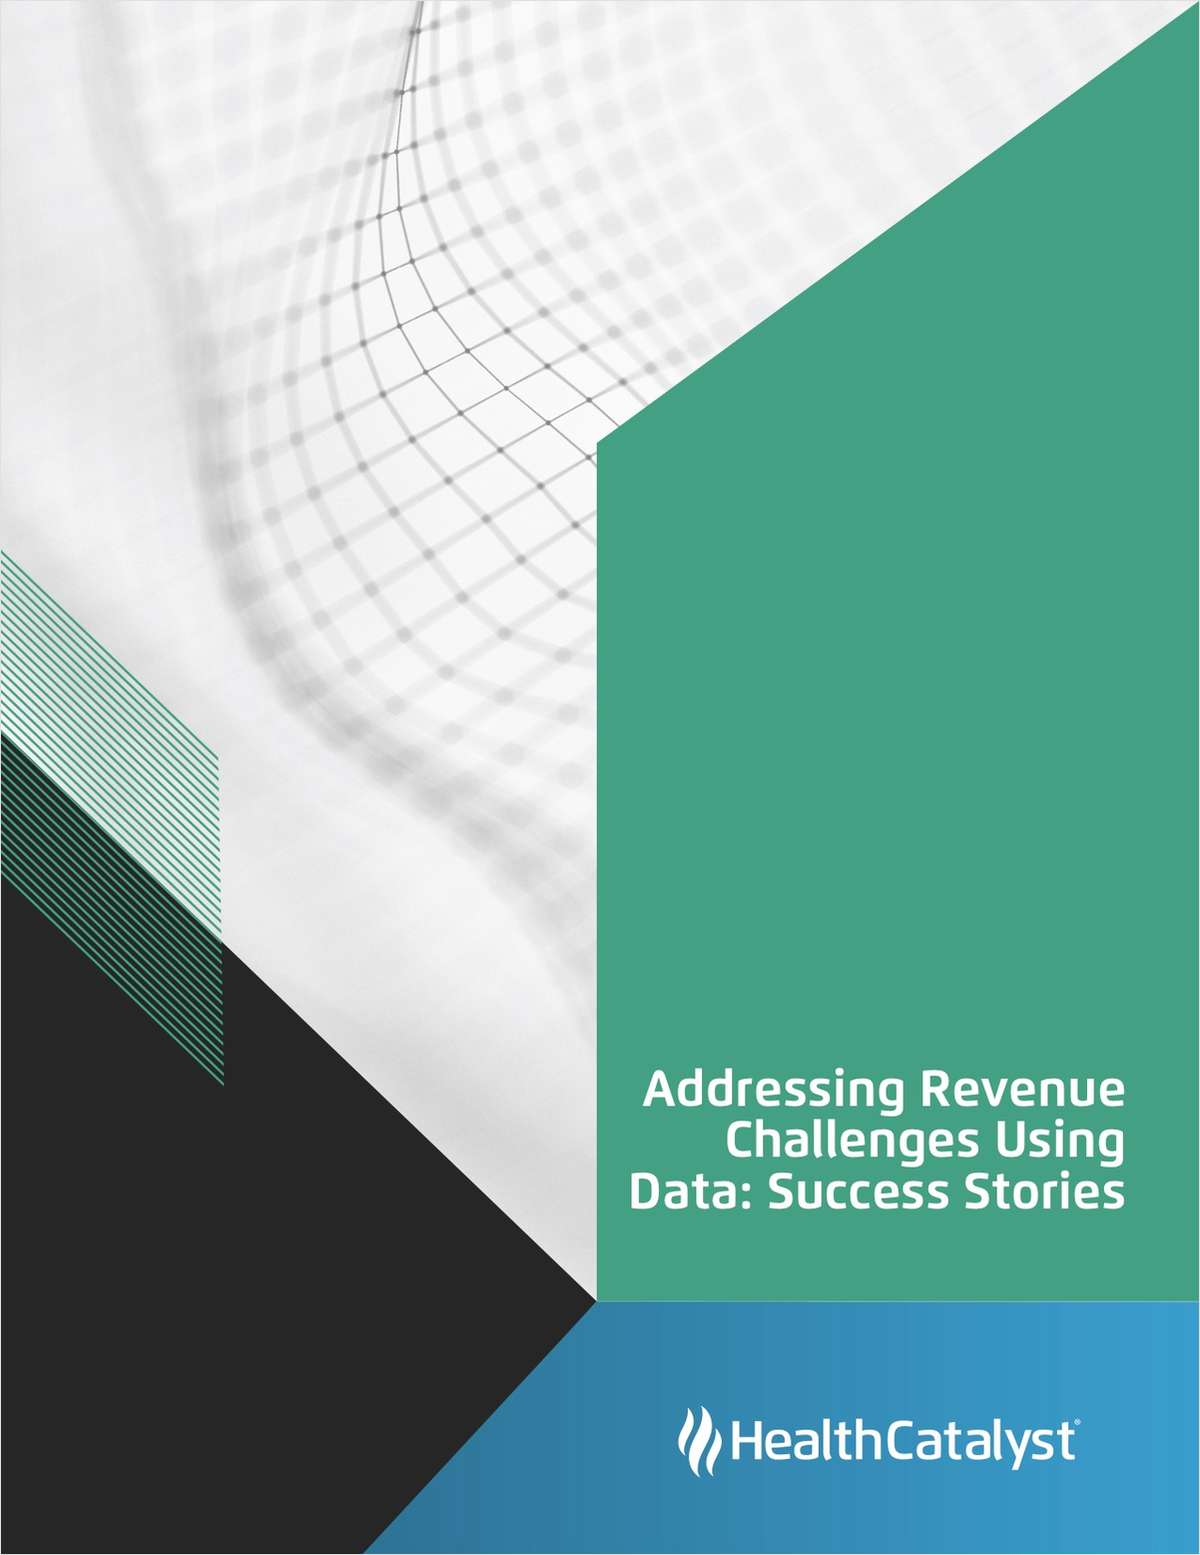 Addressing Revenue Challenges Using Data: Success Stories